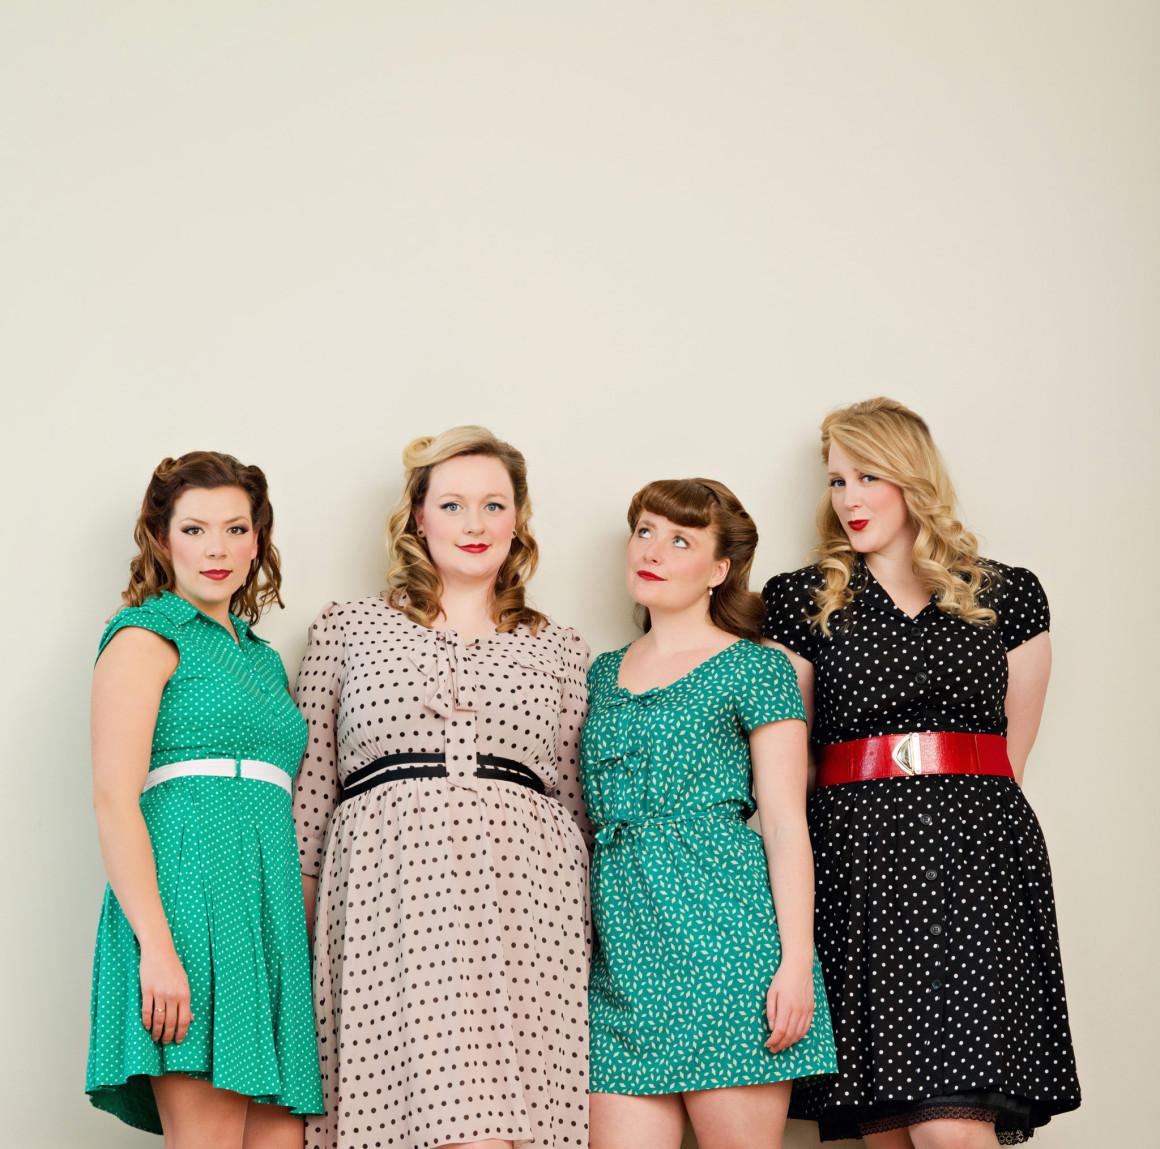 ENT_Rosie&Riveters_courtesy_Jocelyn-Anne-Chillog_WEB